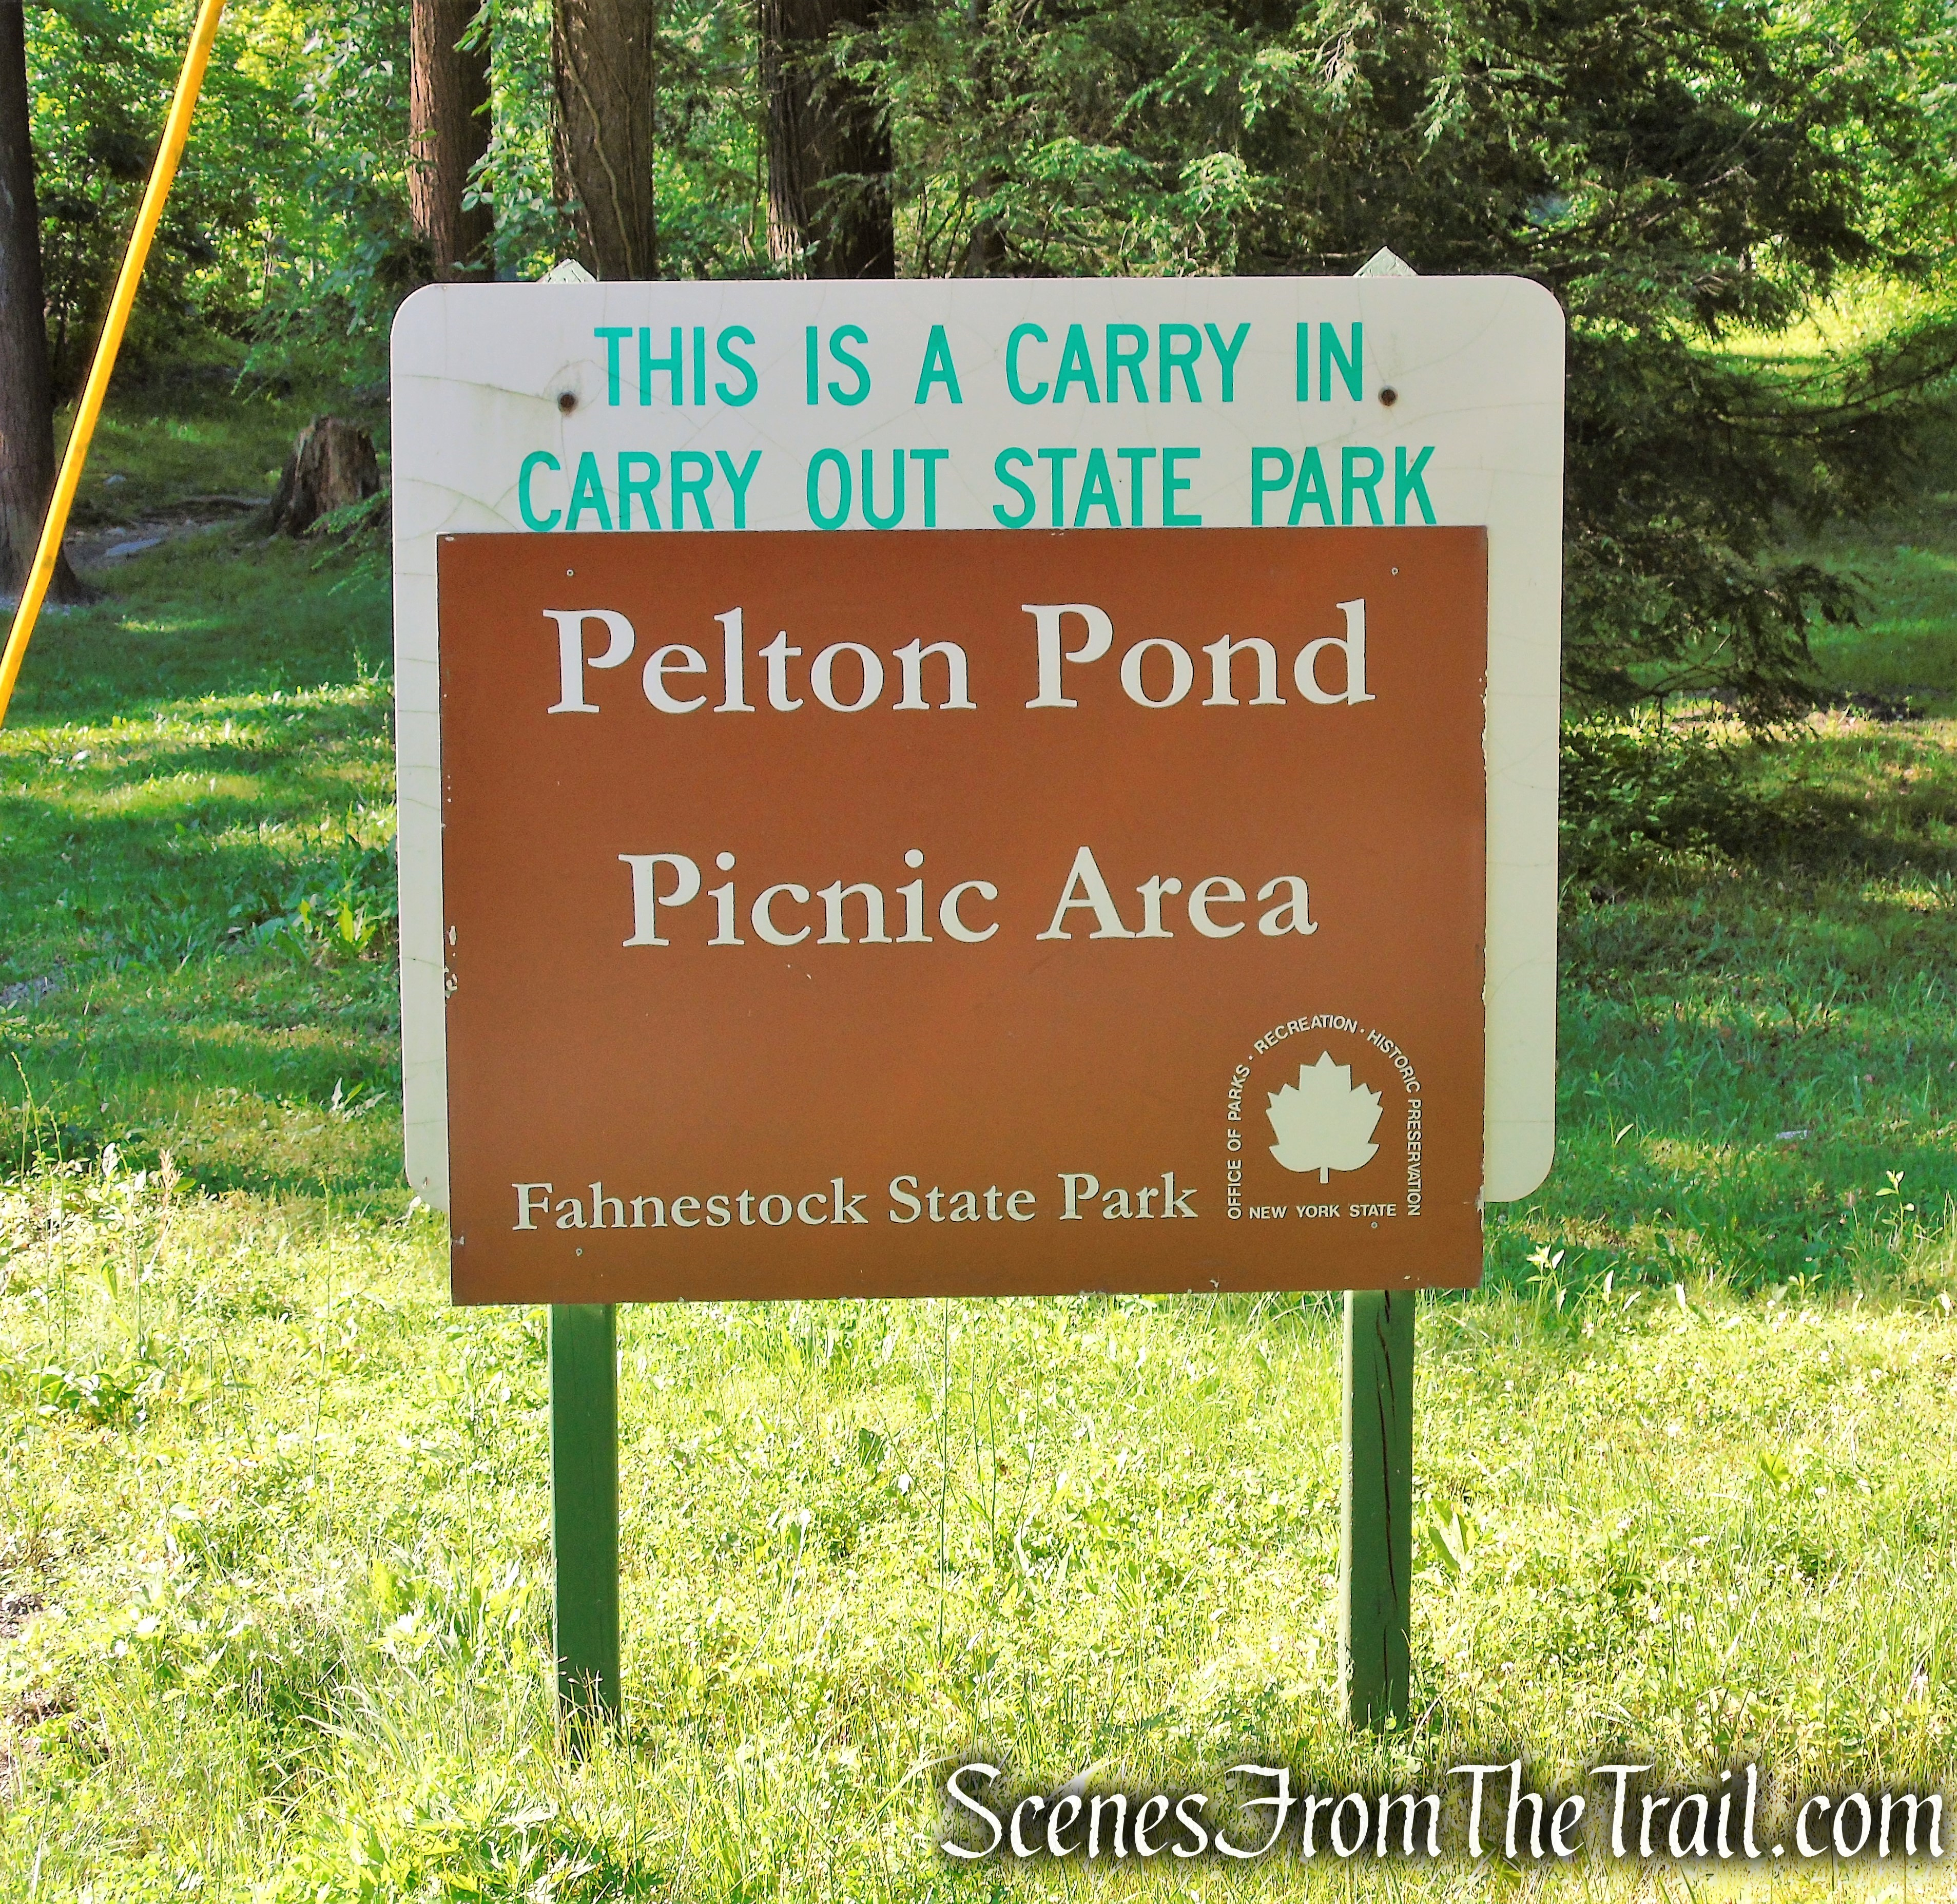 Pelton Pond Picnic Area - Fahnestock State Park